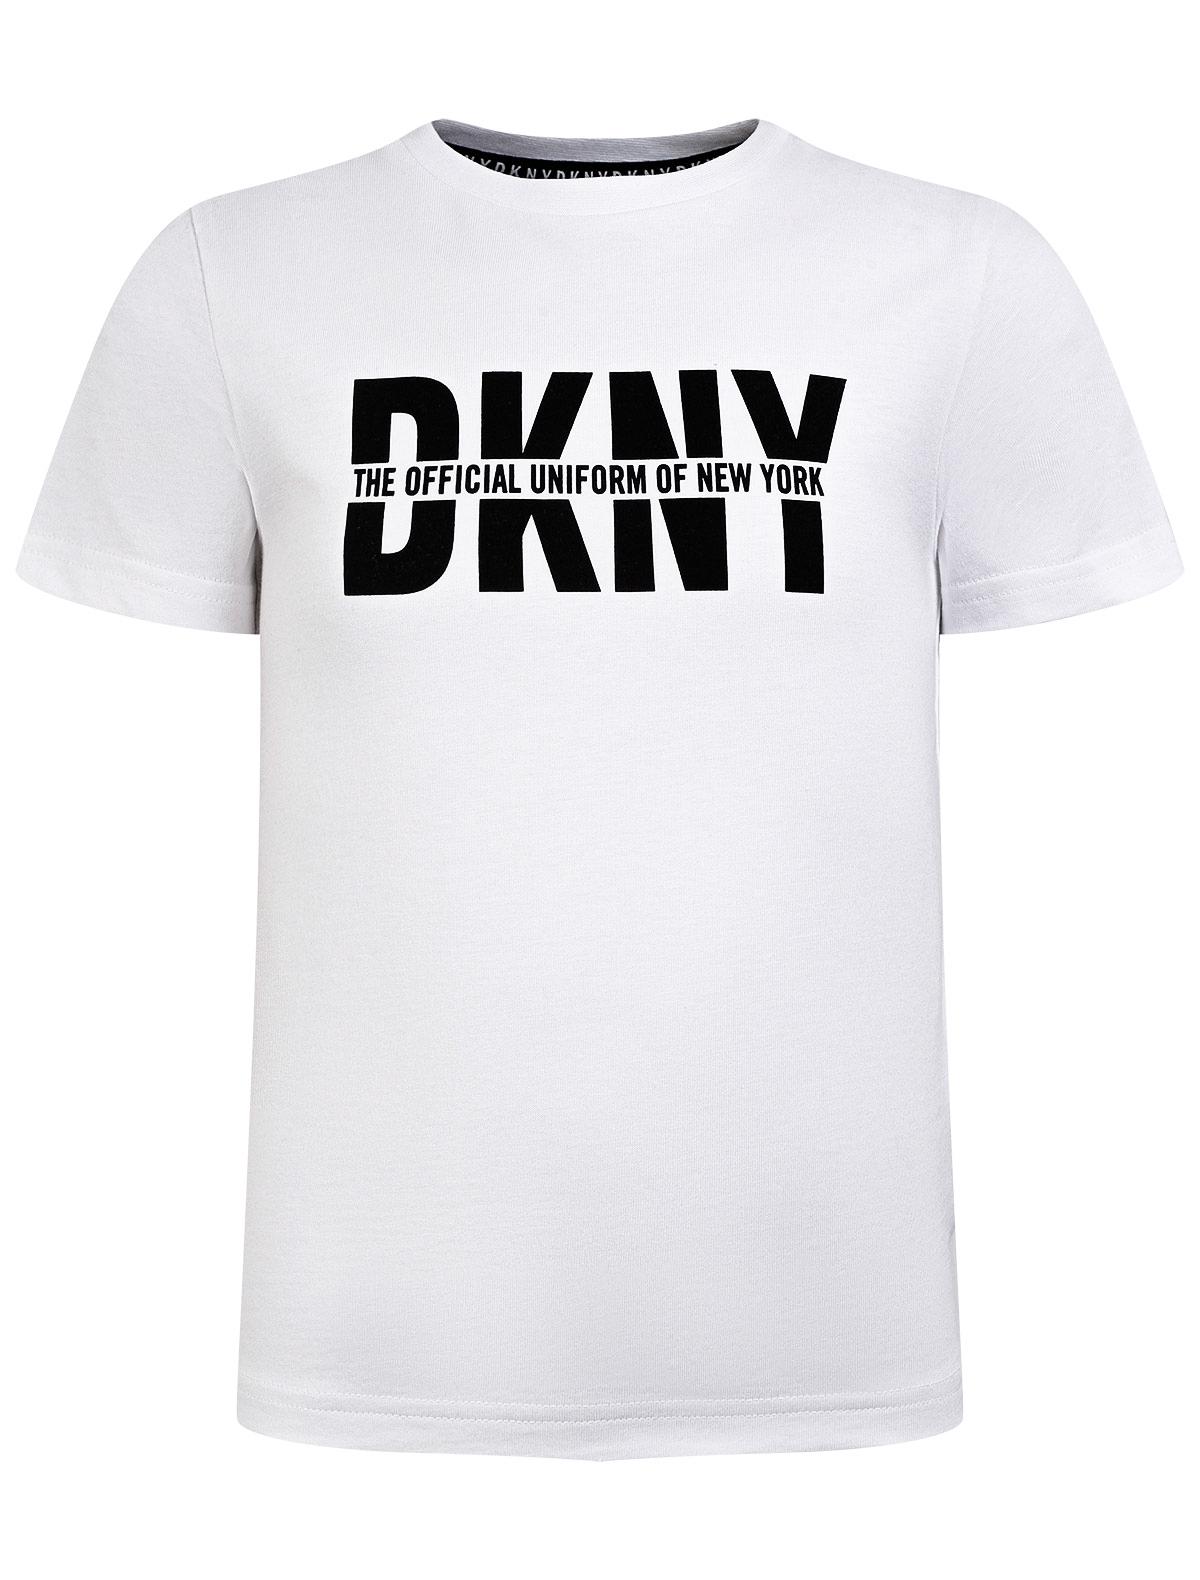 Купить 2283160, Футболка DKNY, белый, 1134529172890